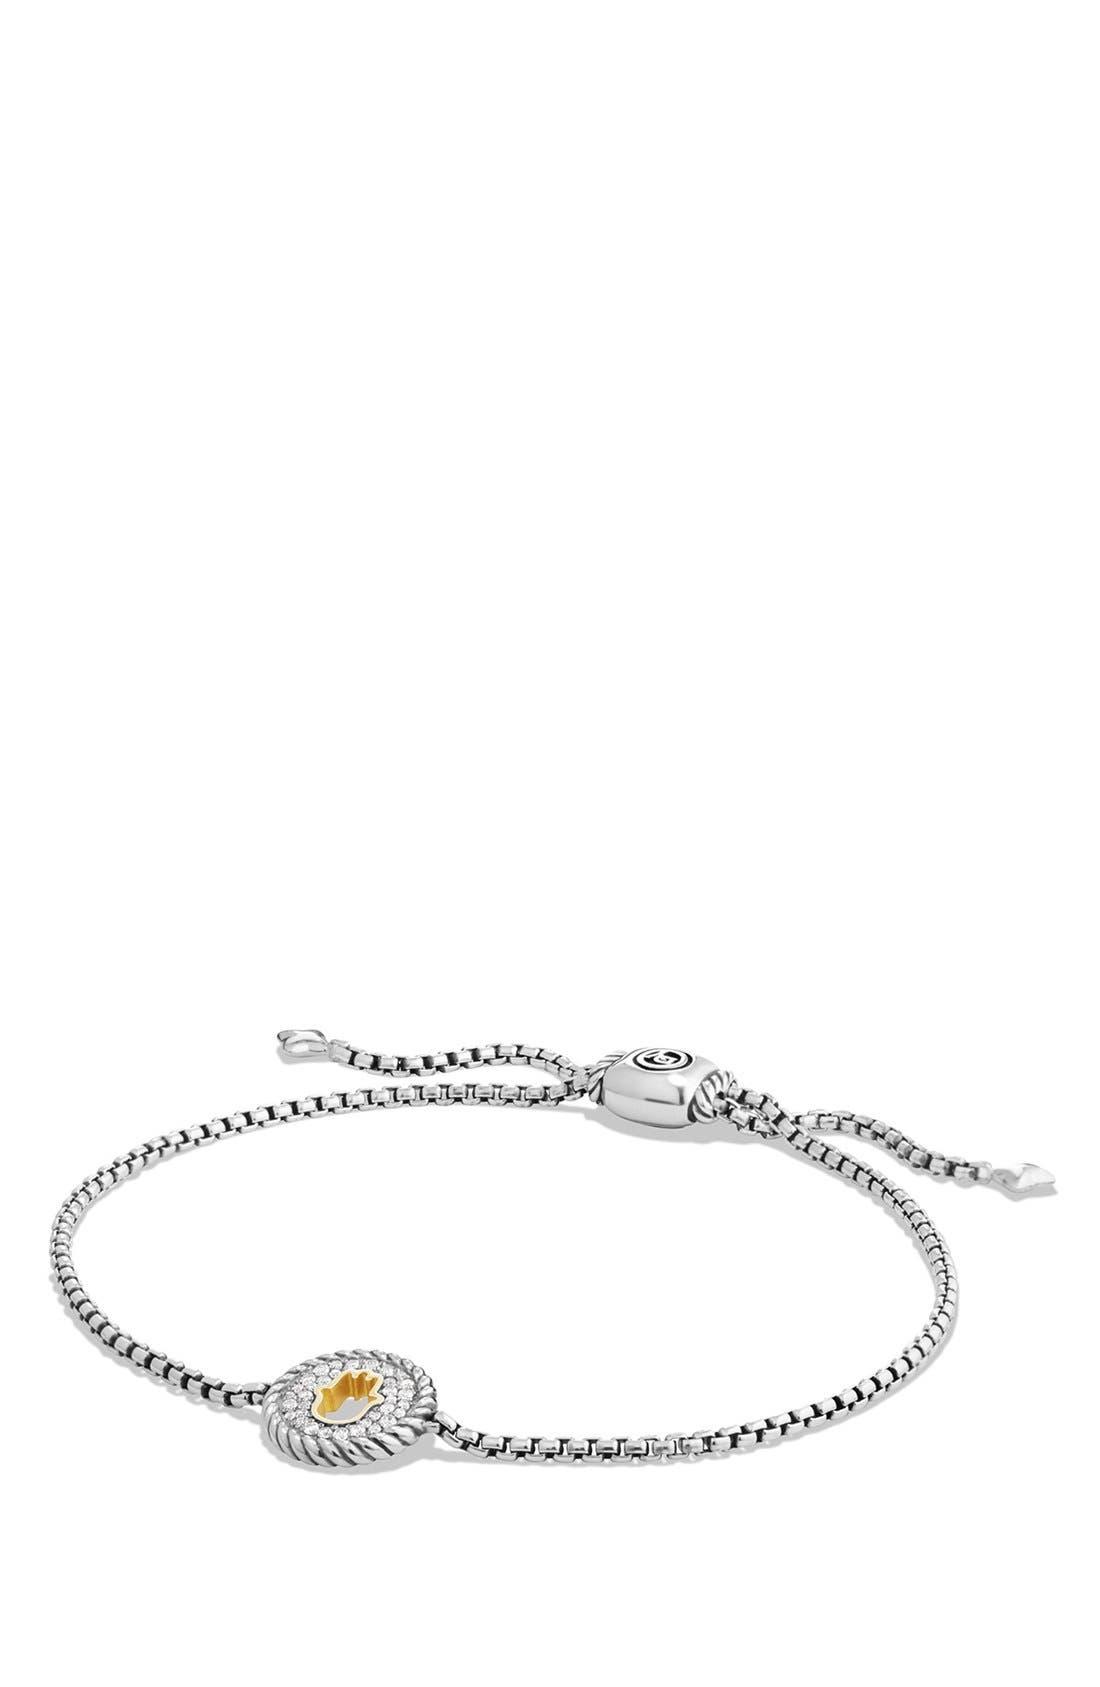 DAVID YURMAN Cable Collection Petite Pavé Hamsa Bracelet